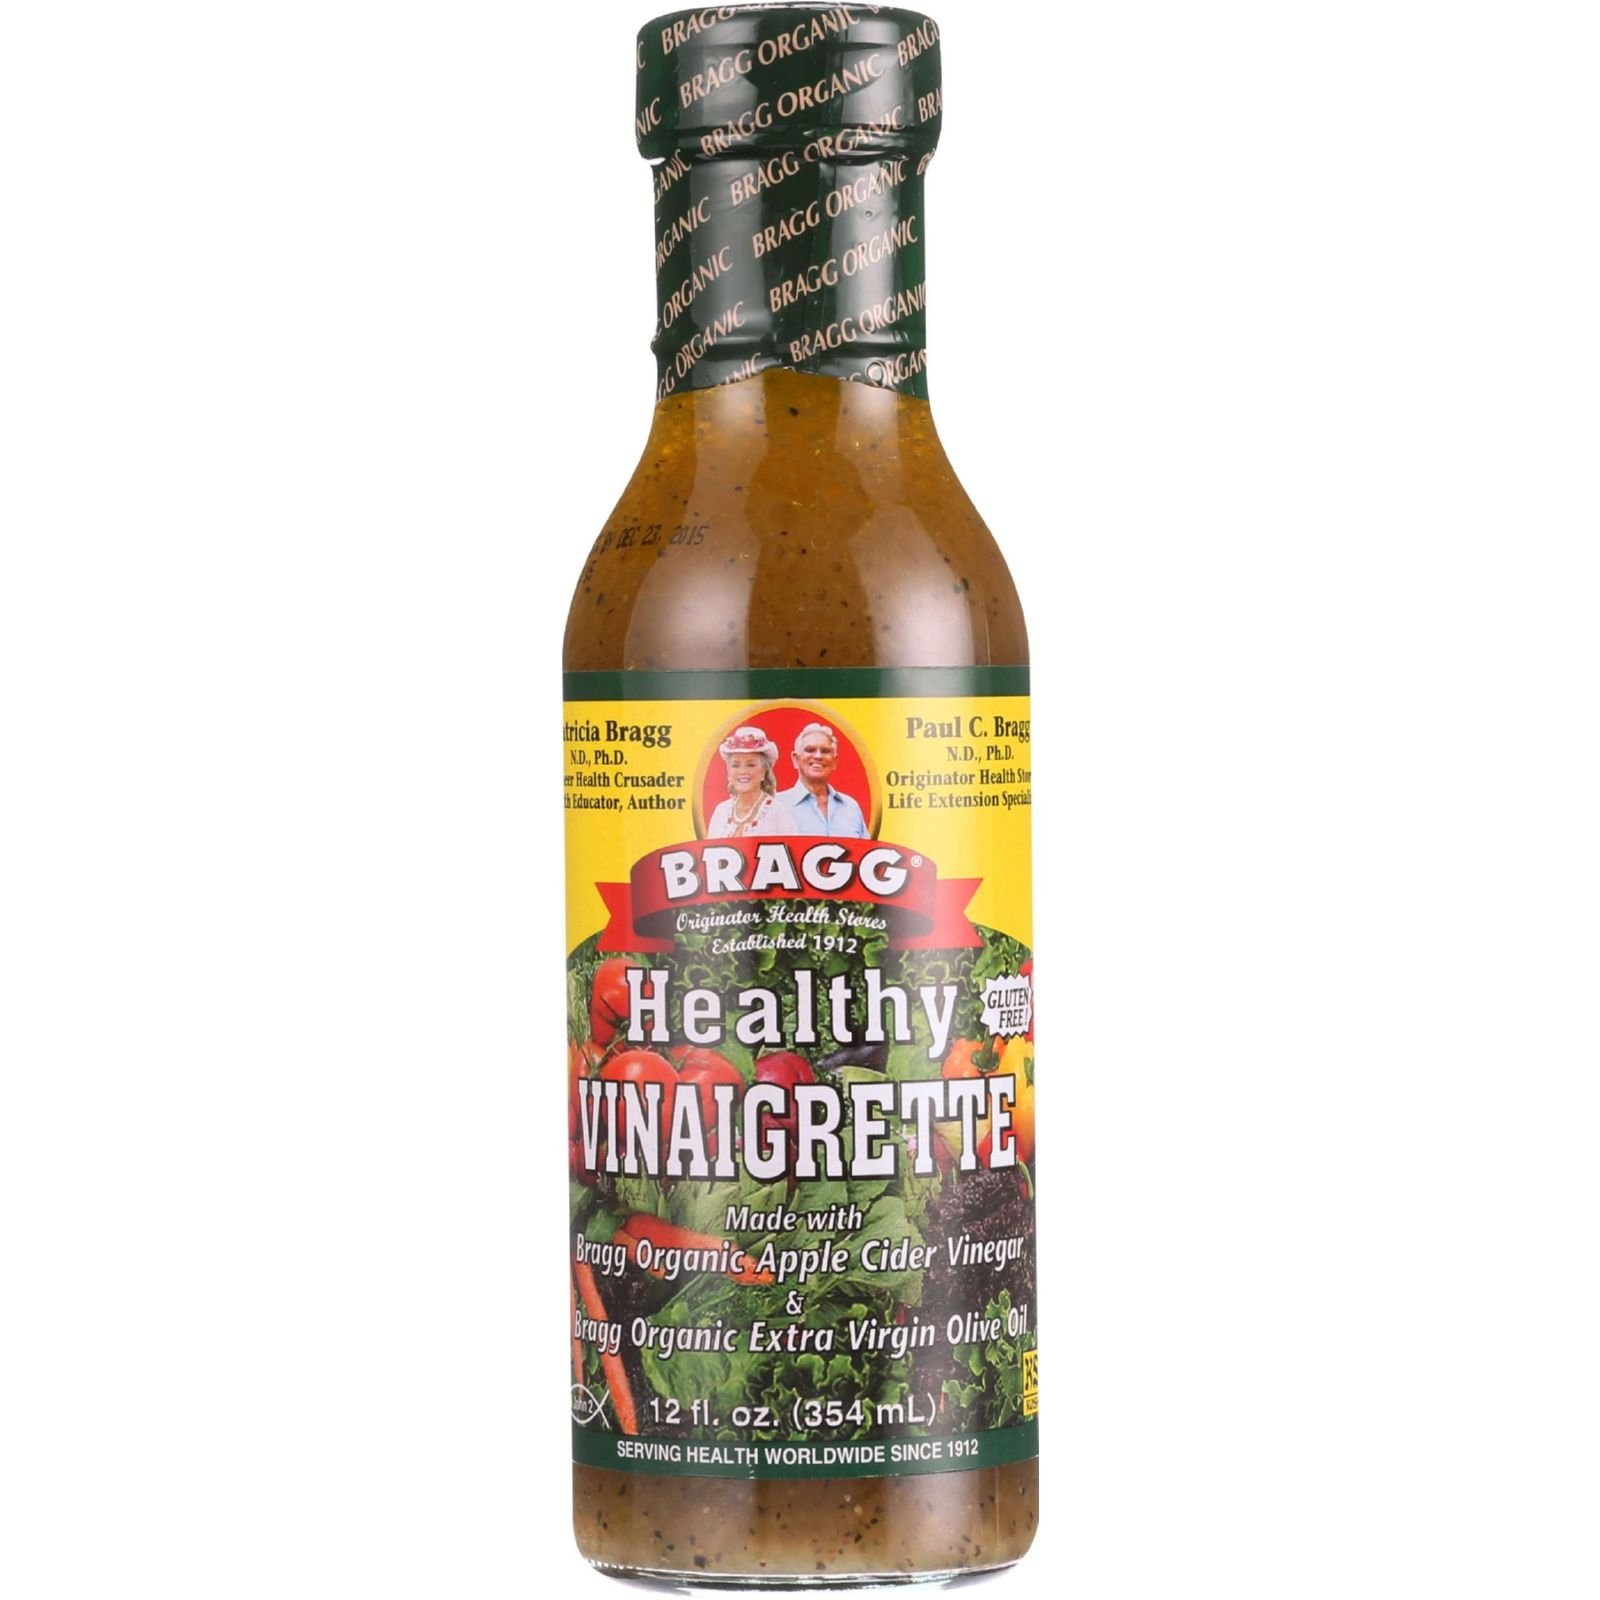 Bragg Vinaigrette - Organic - Healthy - 12 oz - case of 6 - 95%+ Organic - Gluten Free - Dairy Free - - Wheat Free-Vegan